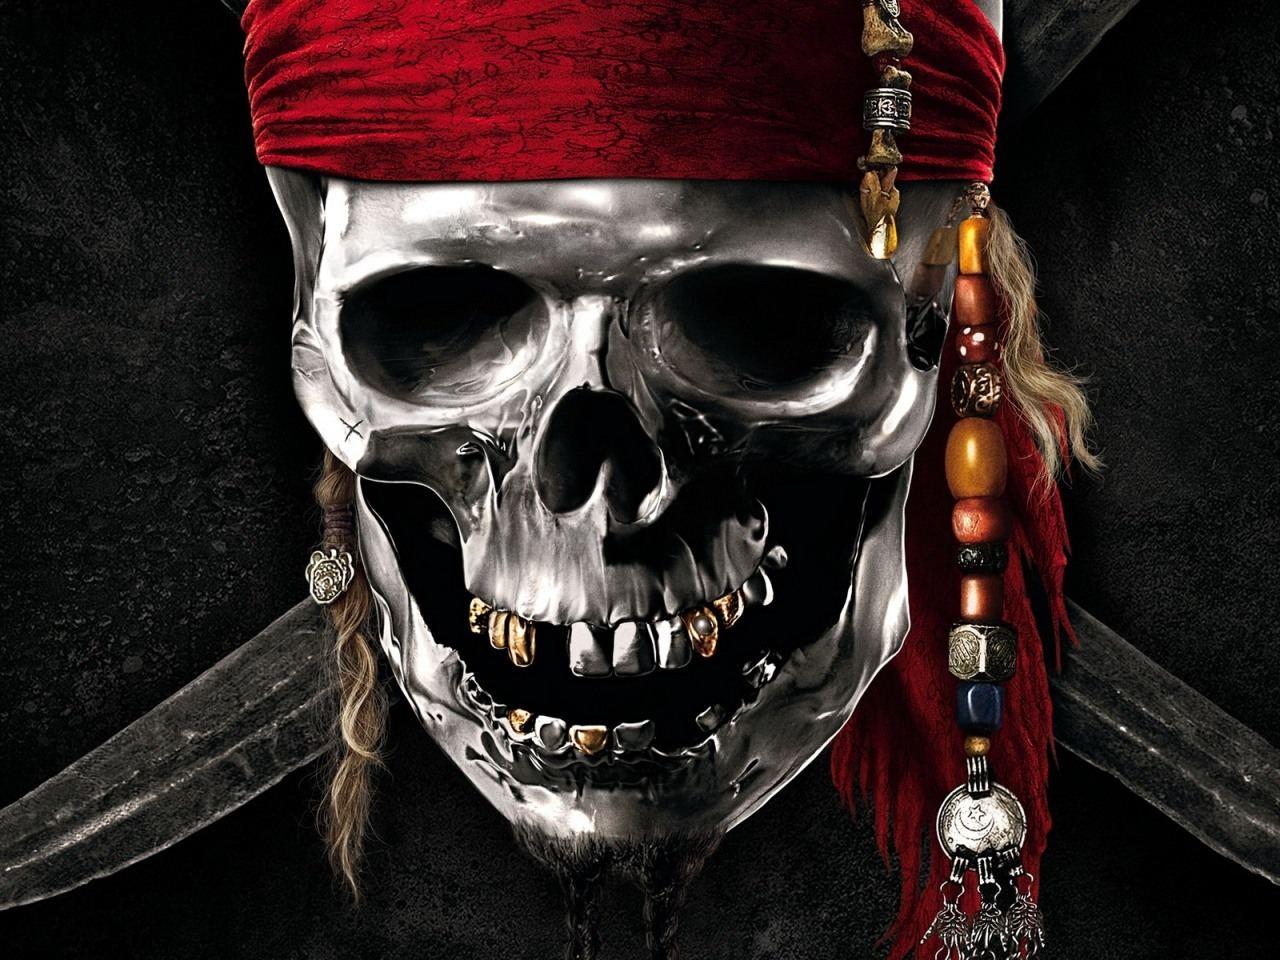 http://1.bp.blogspot.com/-M5CBlNmySvg/TZOuibeV9xI/AAAAAAAAAbQ/_mxdhDs8LAc/s1600/103_pirates_of_the_caribbean_on_stranger_tides_2011.jpg